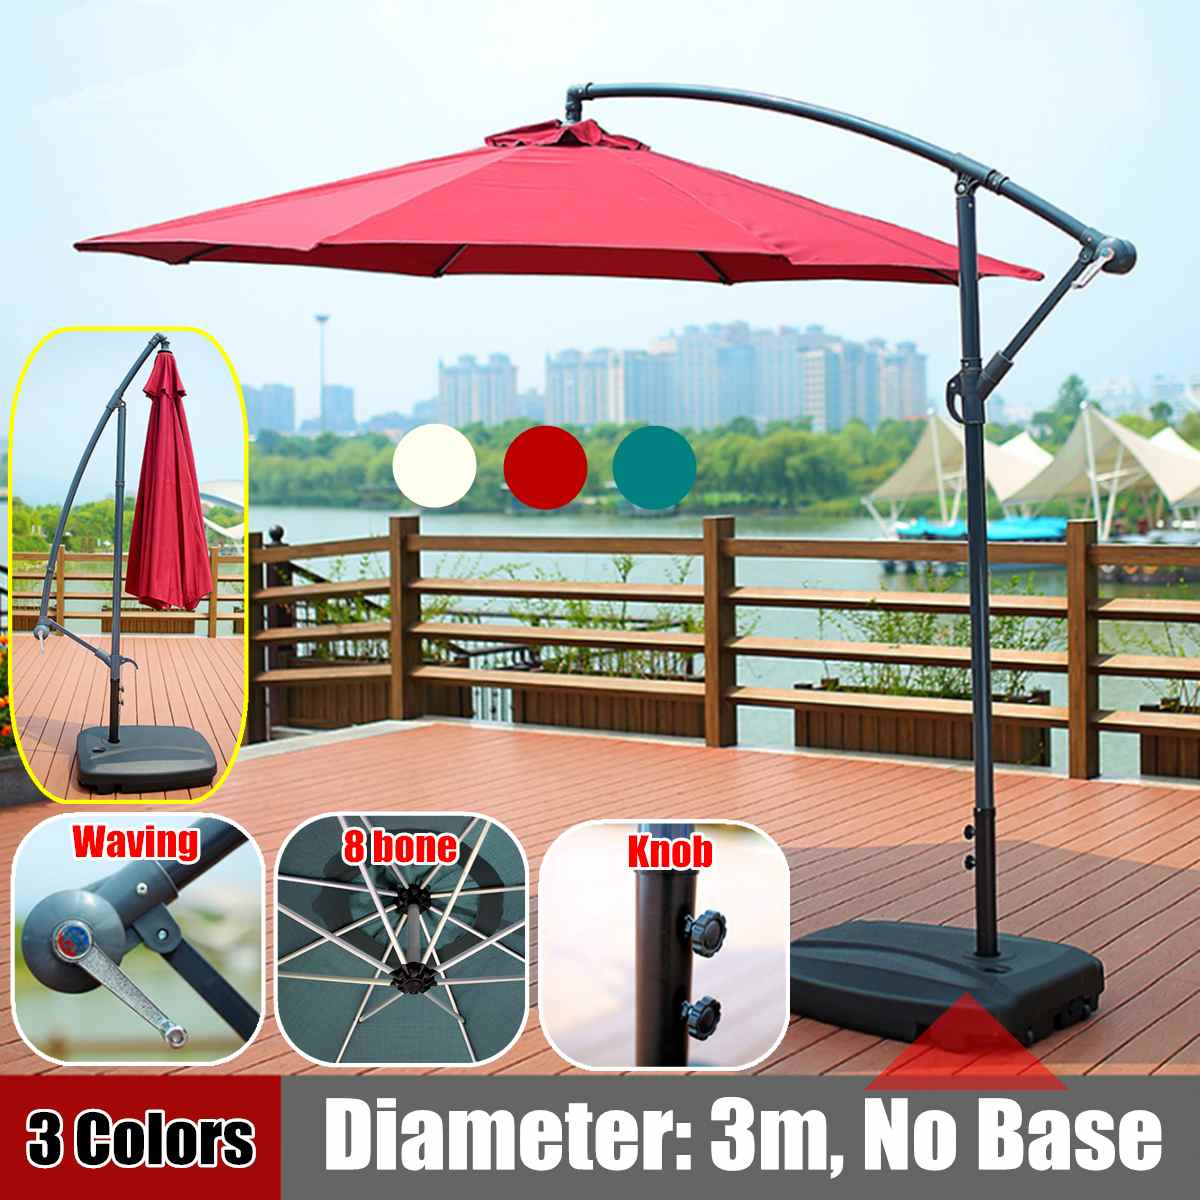 300CM Gazebo Tent With Iron Frame Adjustable Sunshade Outdoor Patio Garden 8-bone Umbrella Tent Canopy Waterproof Anti-UV Cover